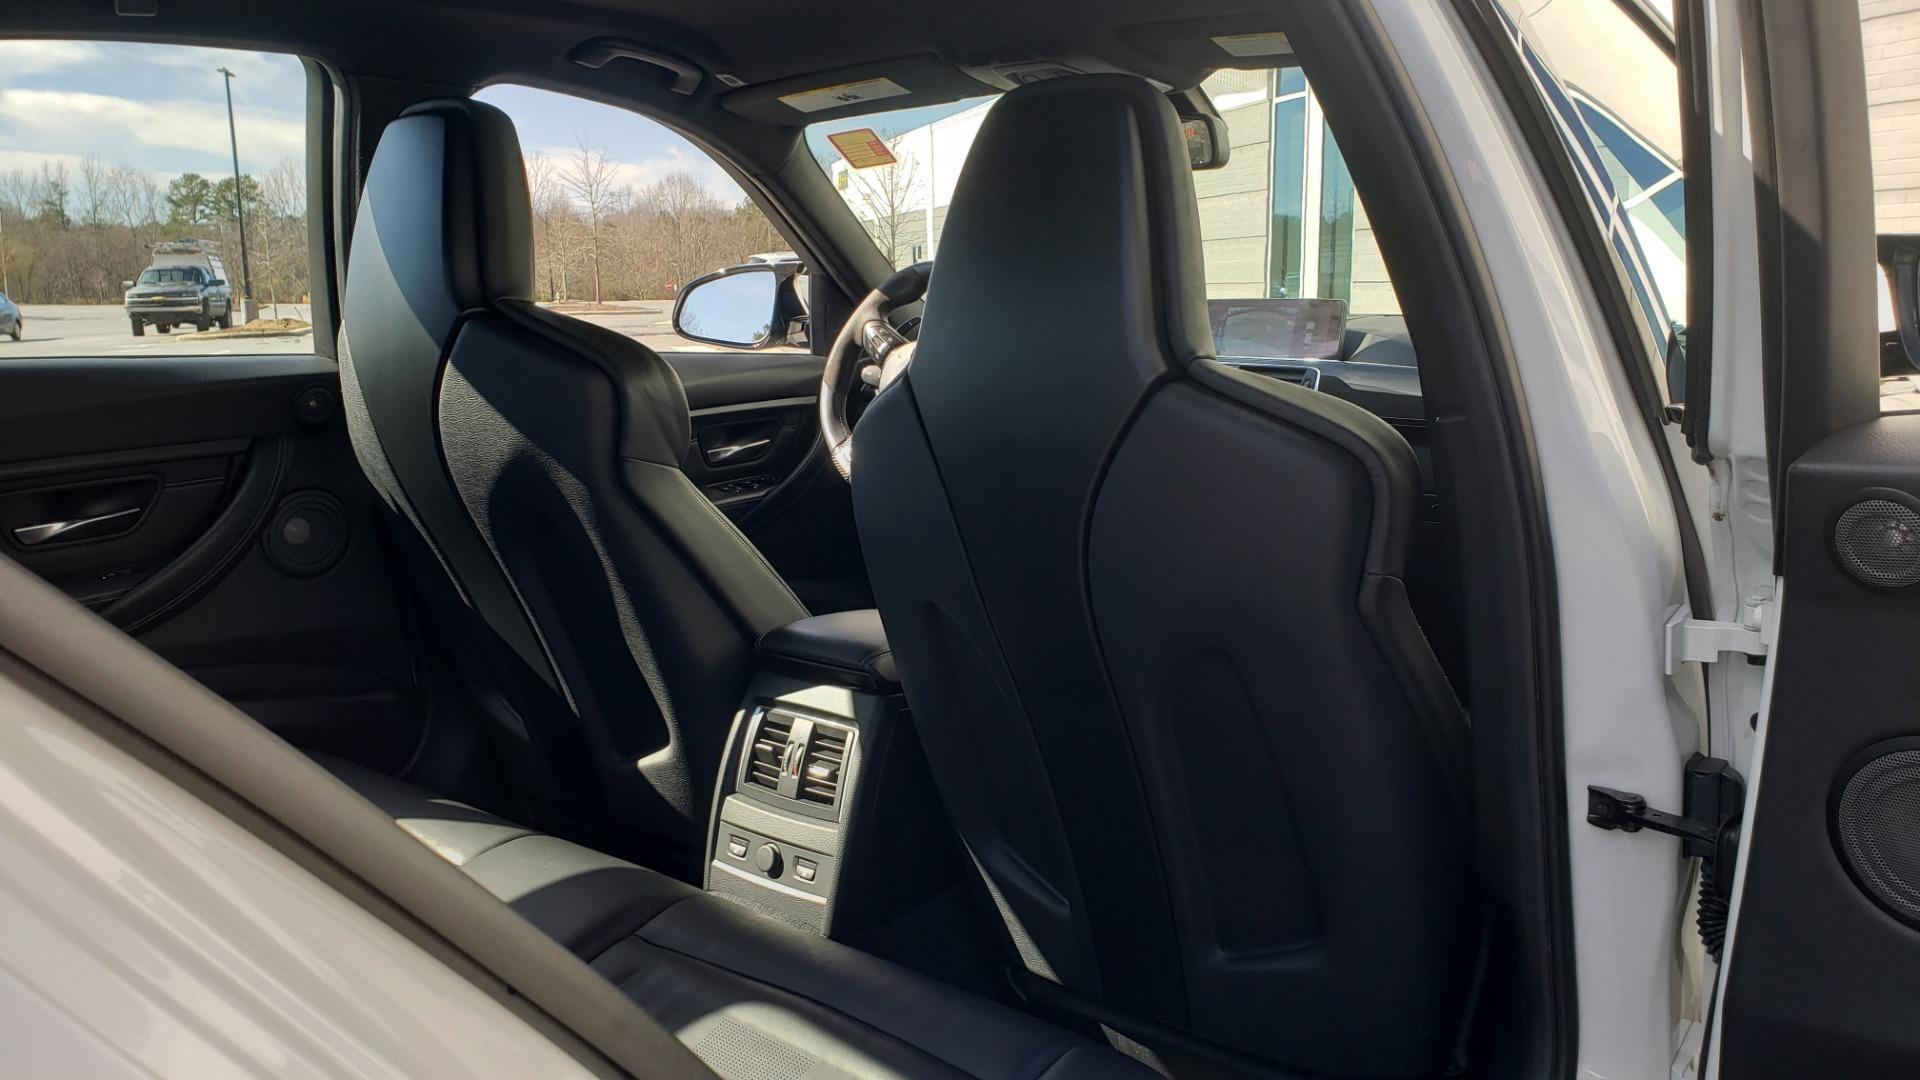 Used 2016 BMW M3 SEDAN / EXECUTIVE PKG / M-SUSPENSION / HARMAN/KARDON SOUND for sale Sold at Formula Imports in Charlotte NC 28227 75